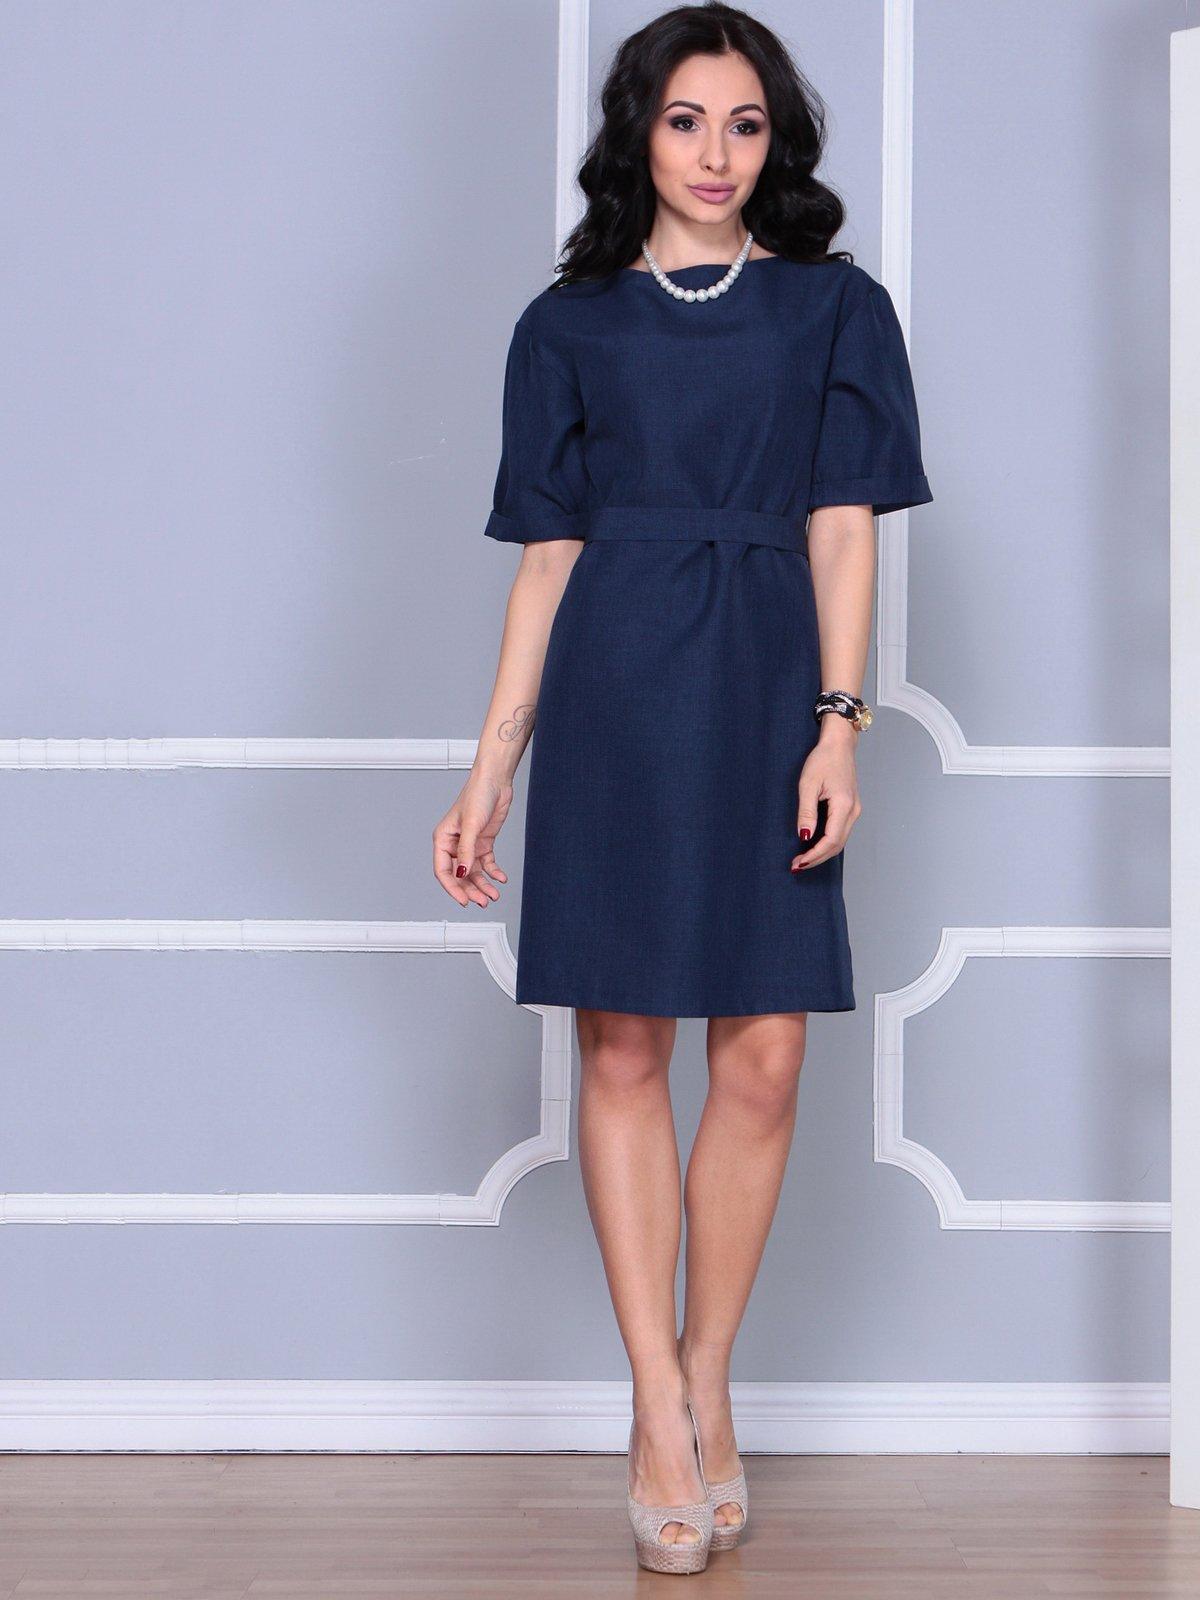 Платье темно-синее   4028060   фото 4